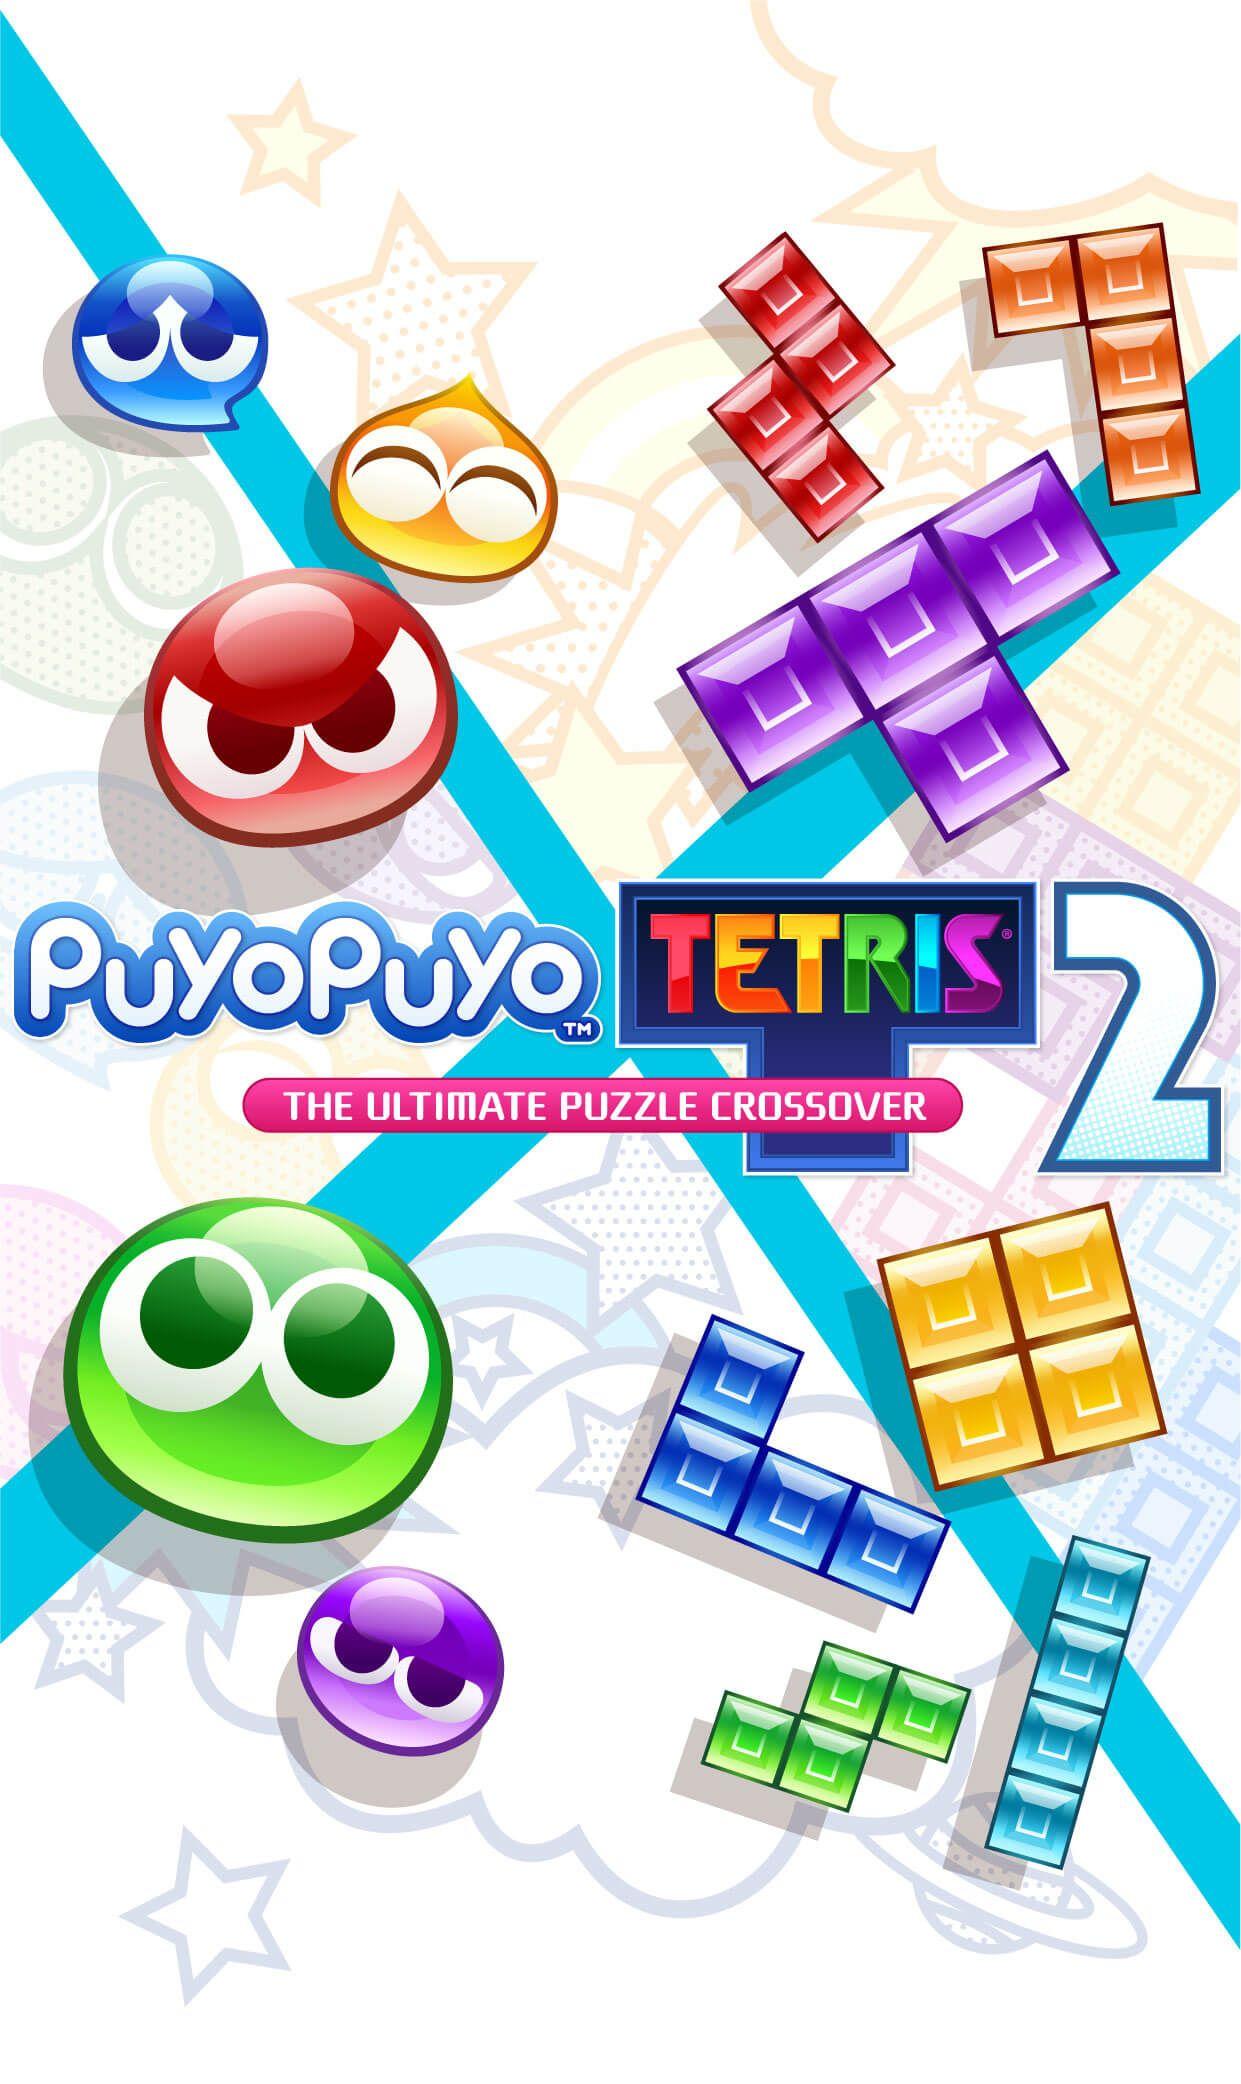 Puyo Puyo Tetris 2 Portada